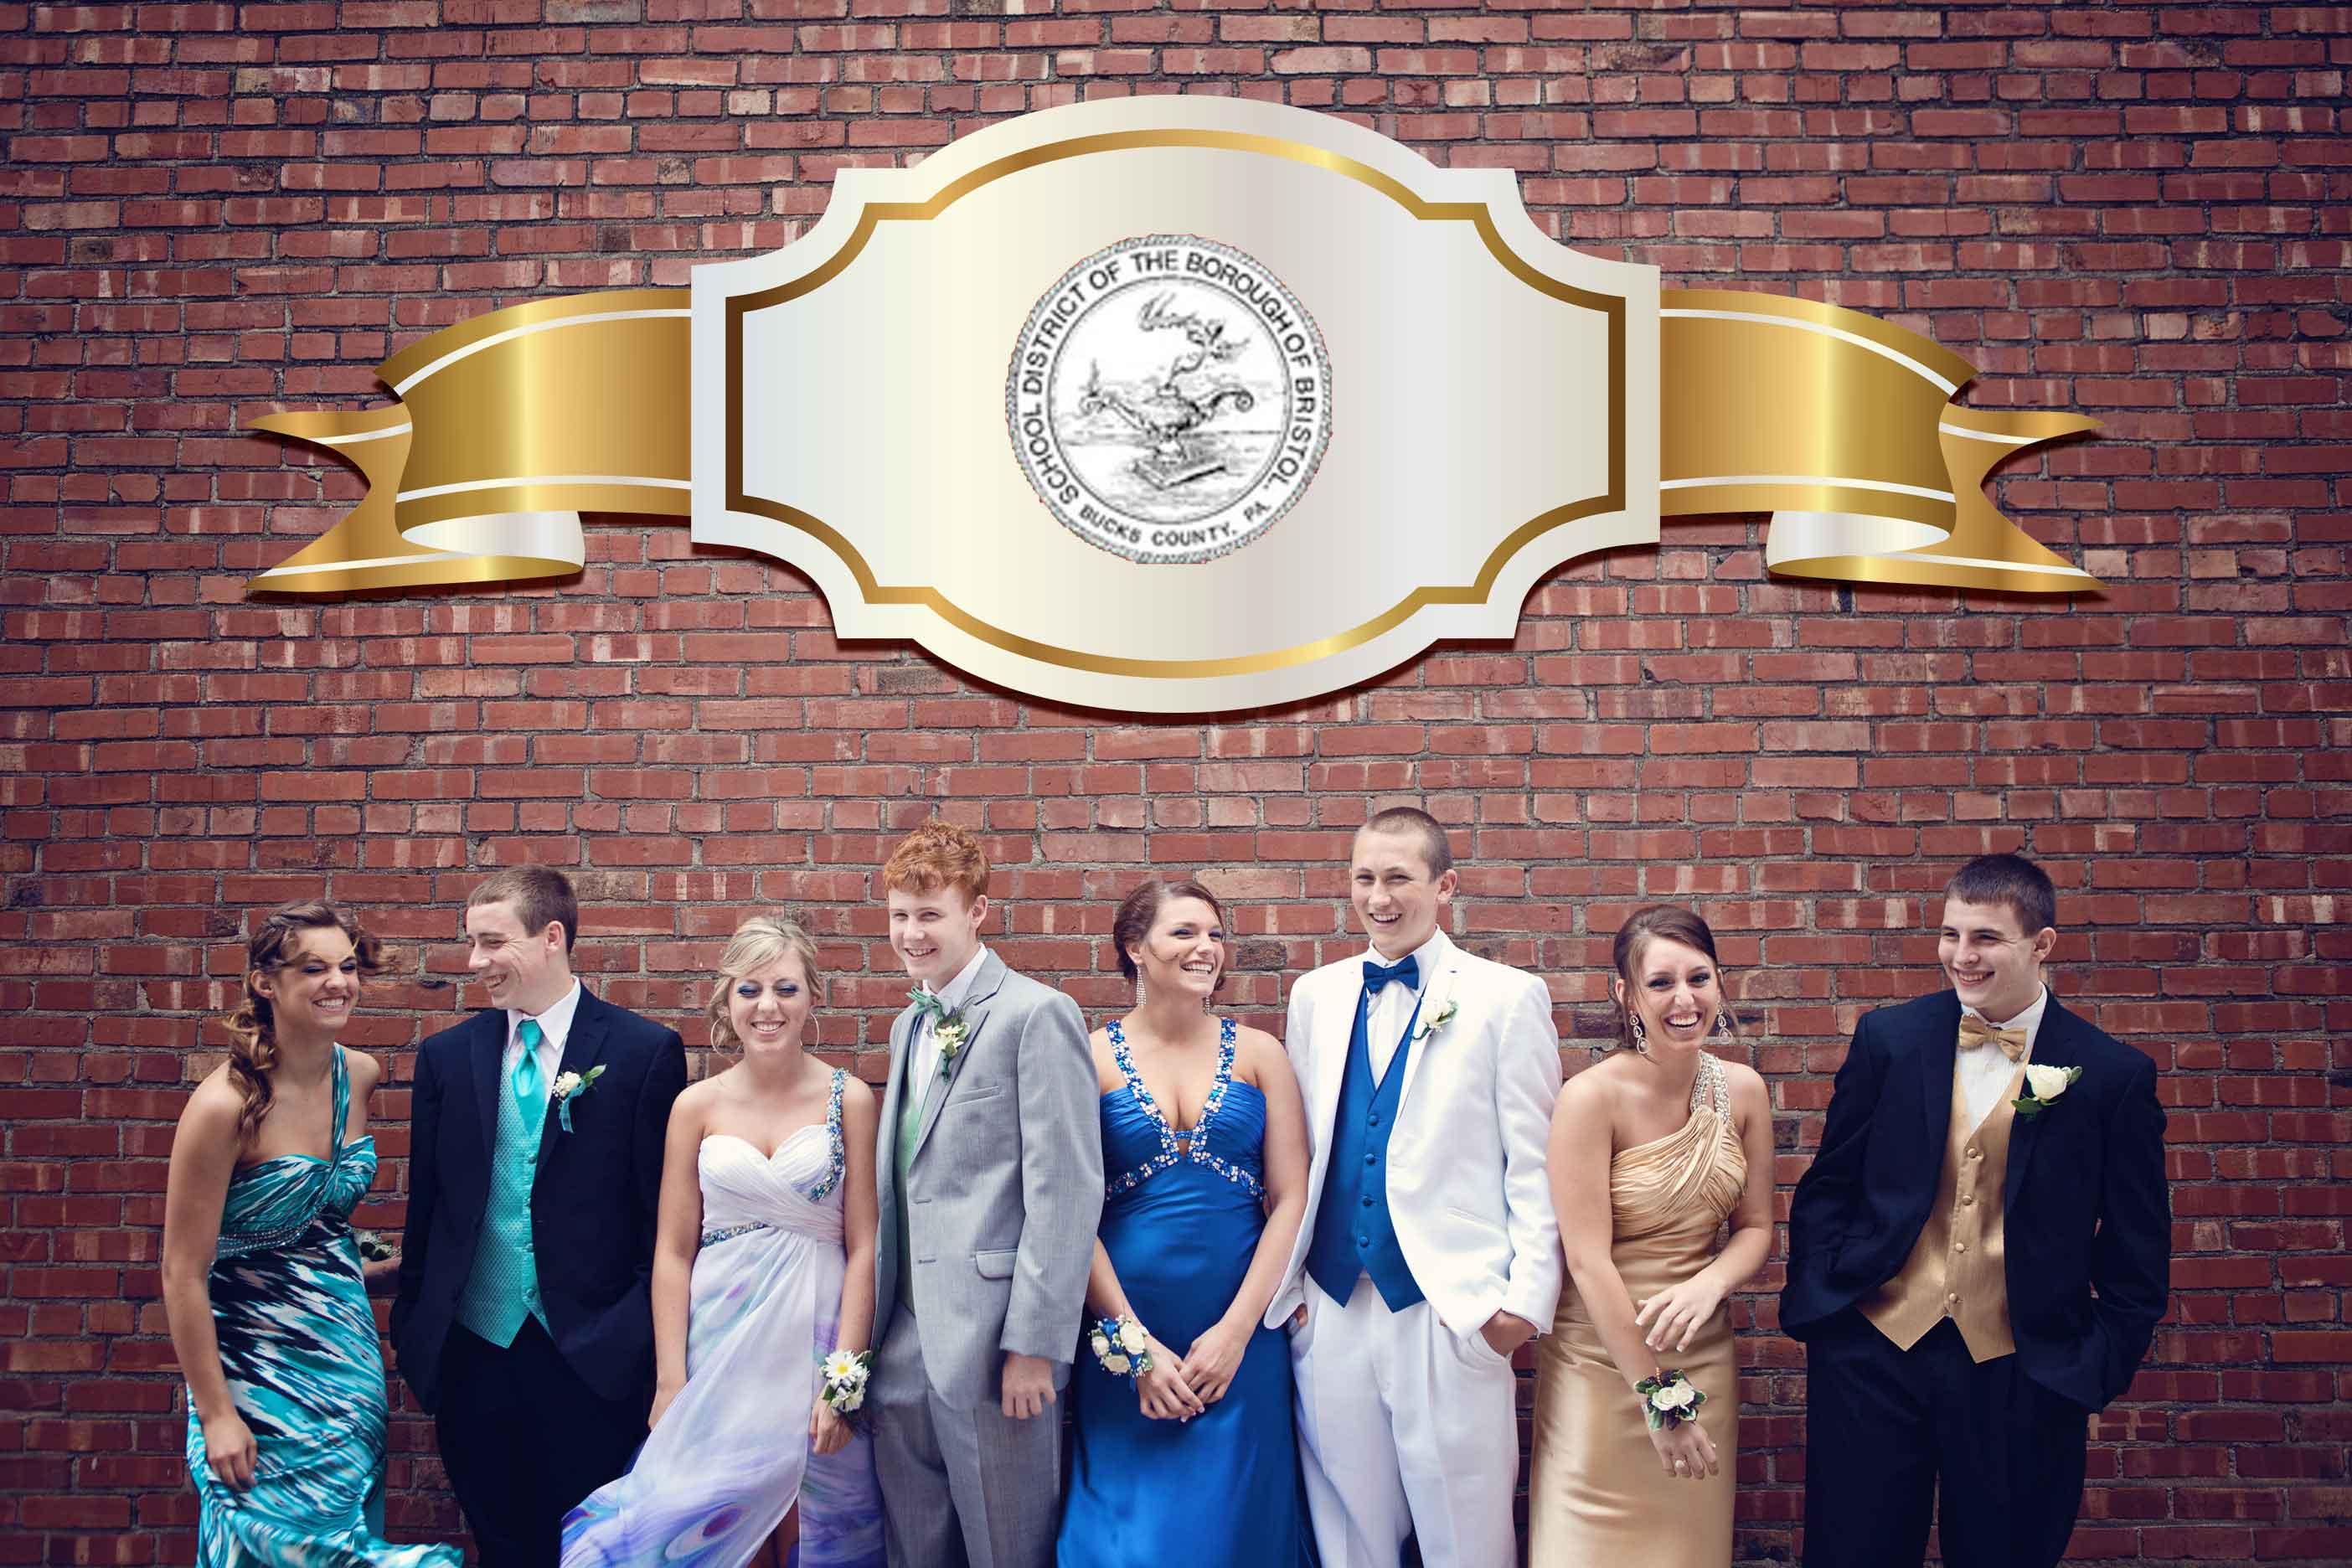 bristol high school prom